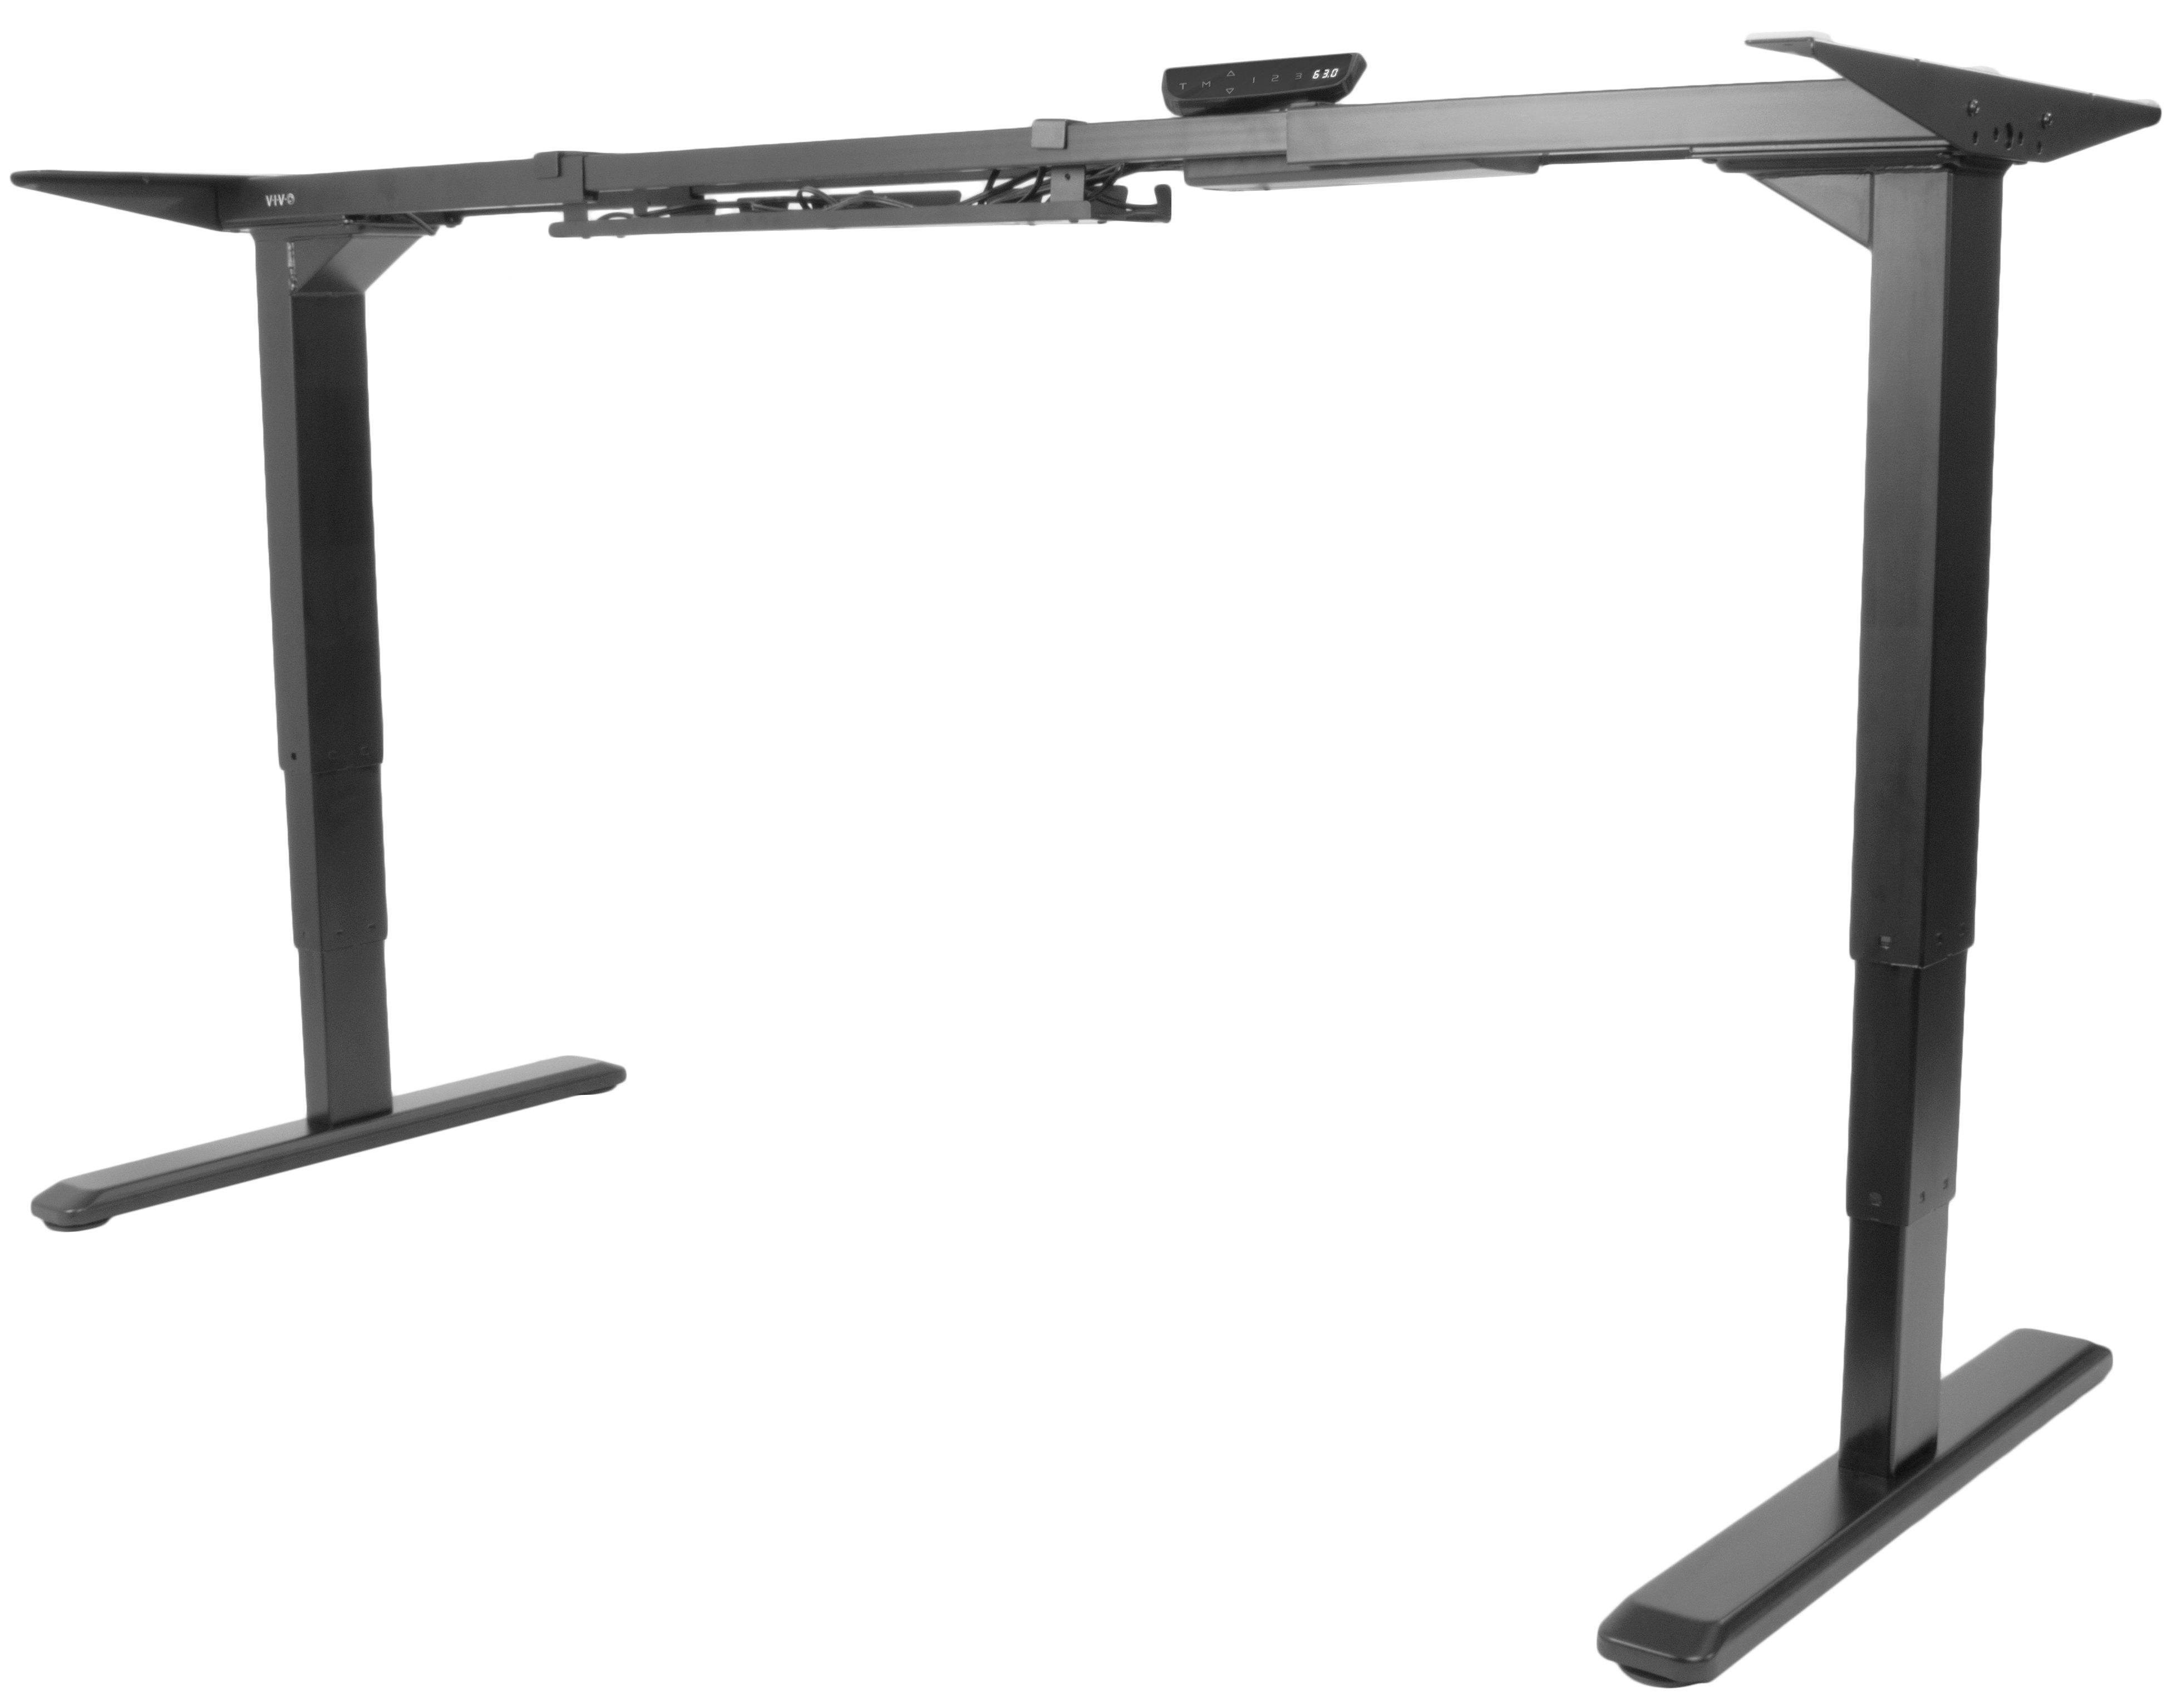 VIVO   Rakuten: VIVO Electric Stand Up Desk Frame Dual Motor, Cable ...